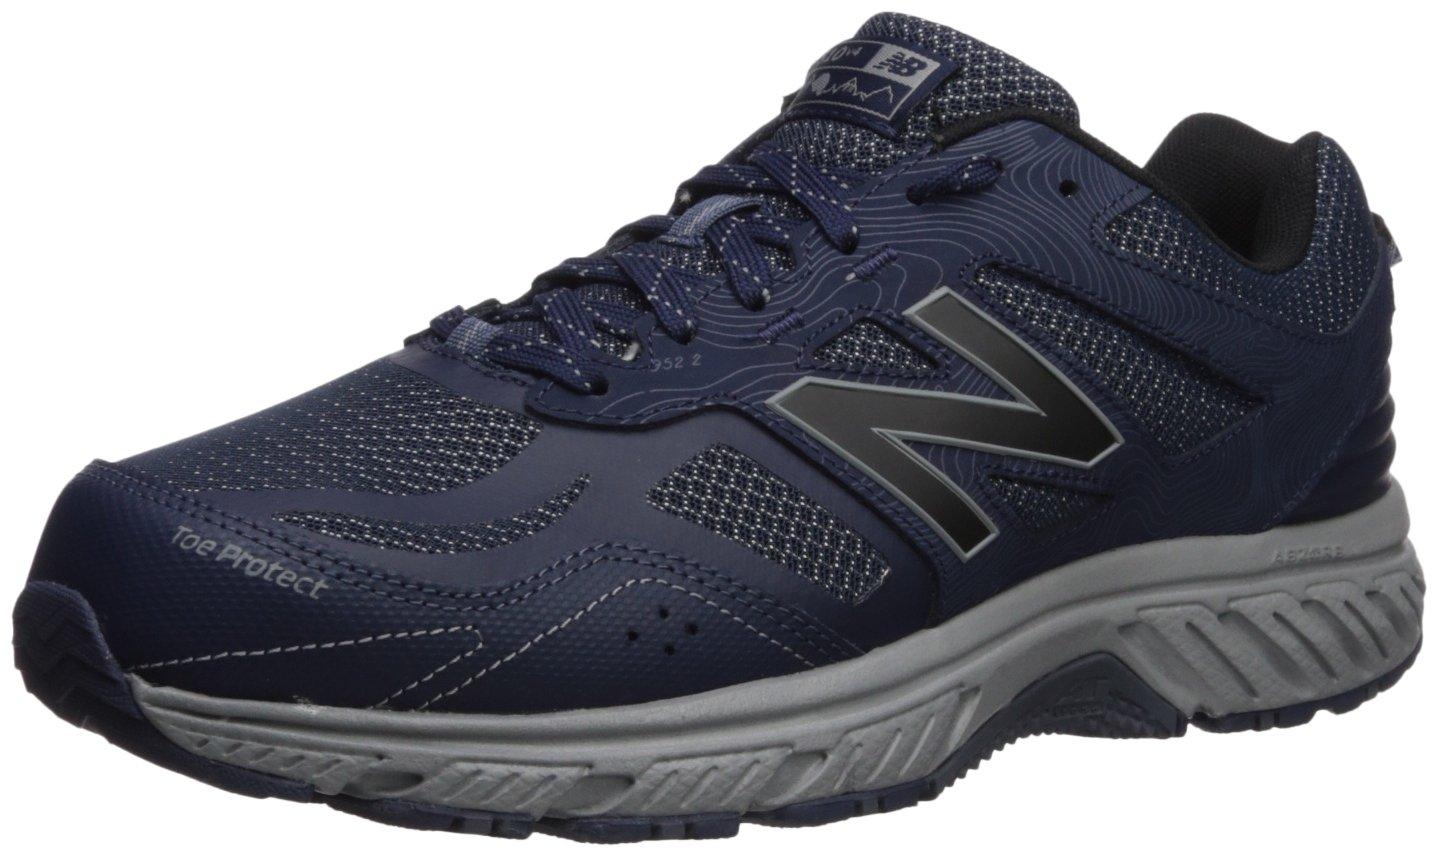 New Balance Men's 510v4 Cushioning Trail Running Shoe, Navy/Grey, 8 4E US by New Balance